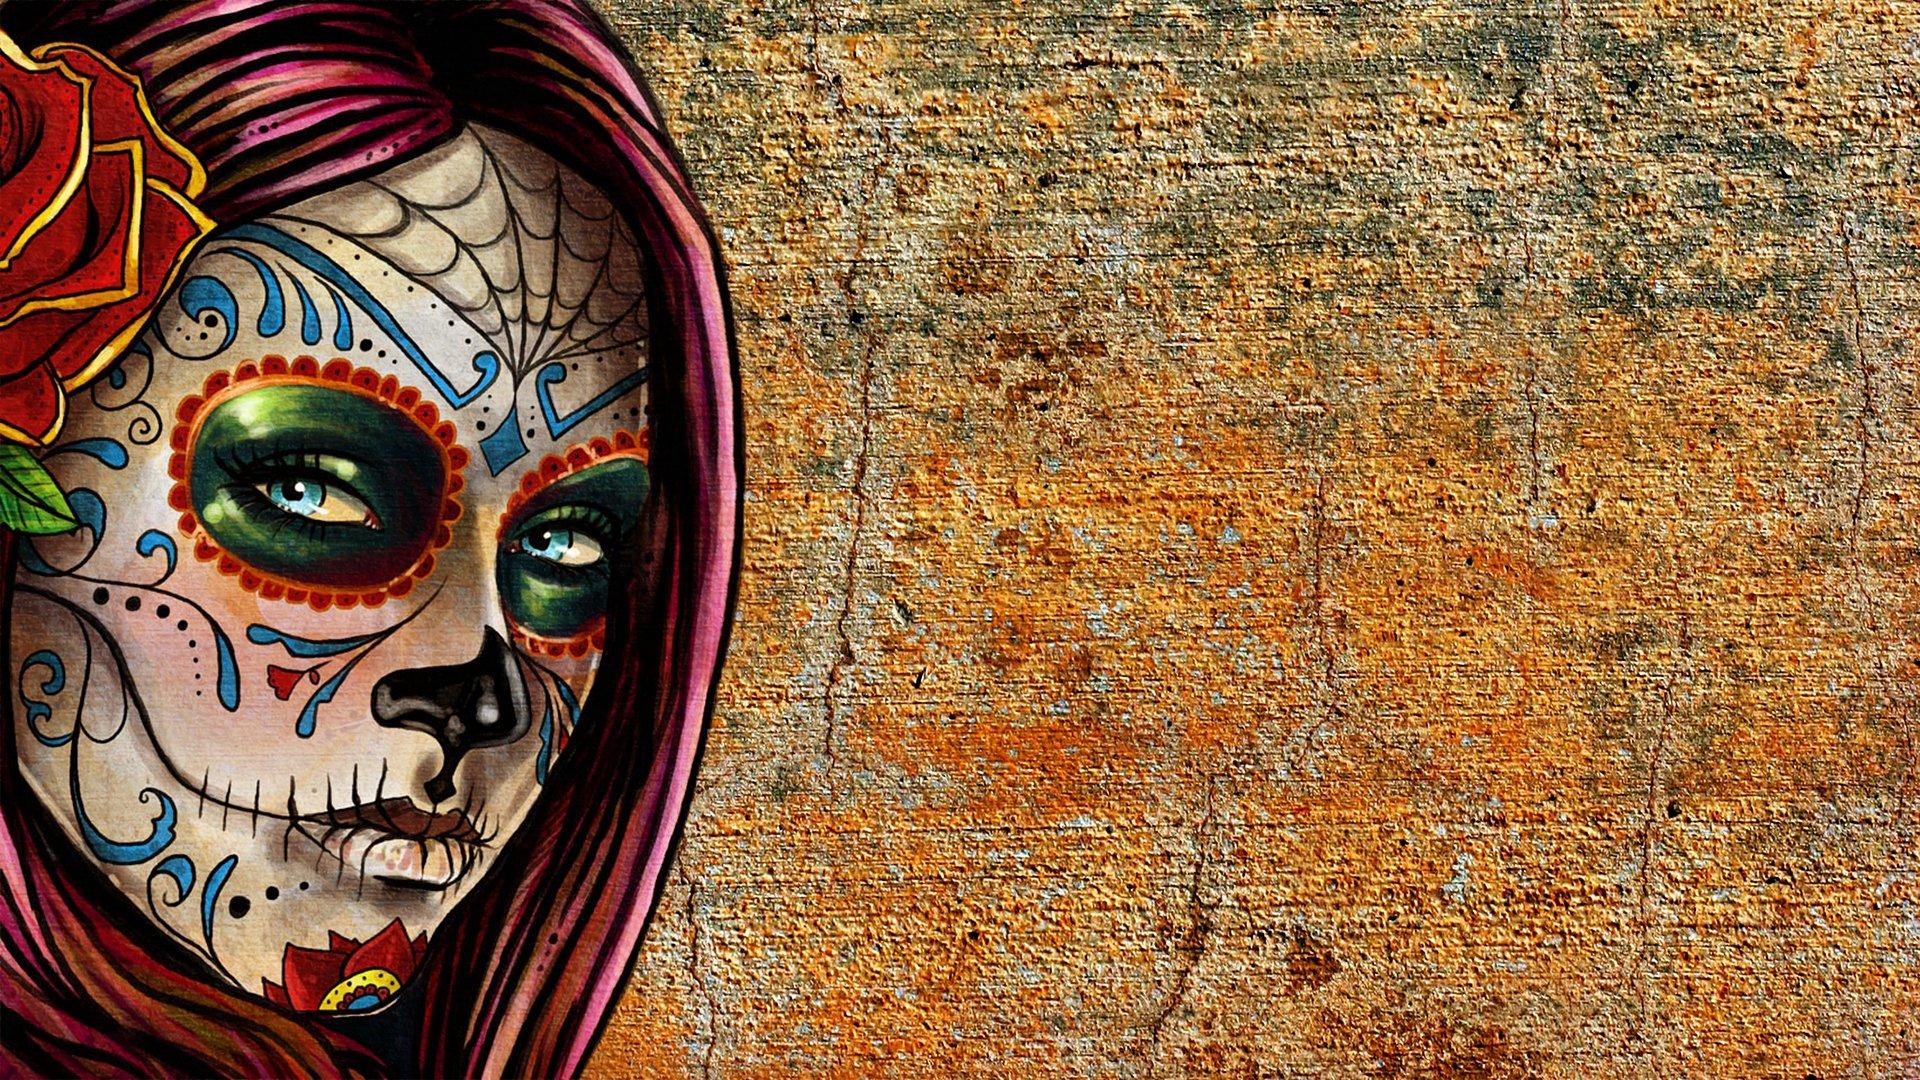 Sugar Skull HD Wallpaper | Background Image | 1920x1080 ...